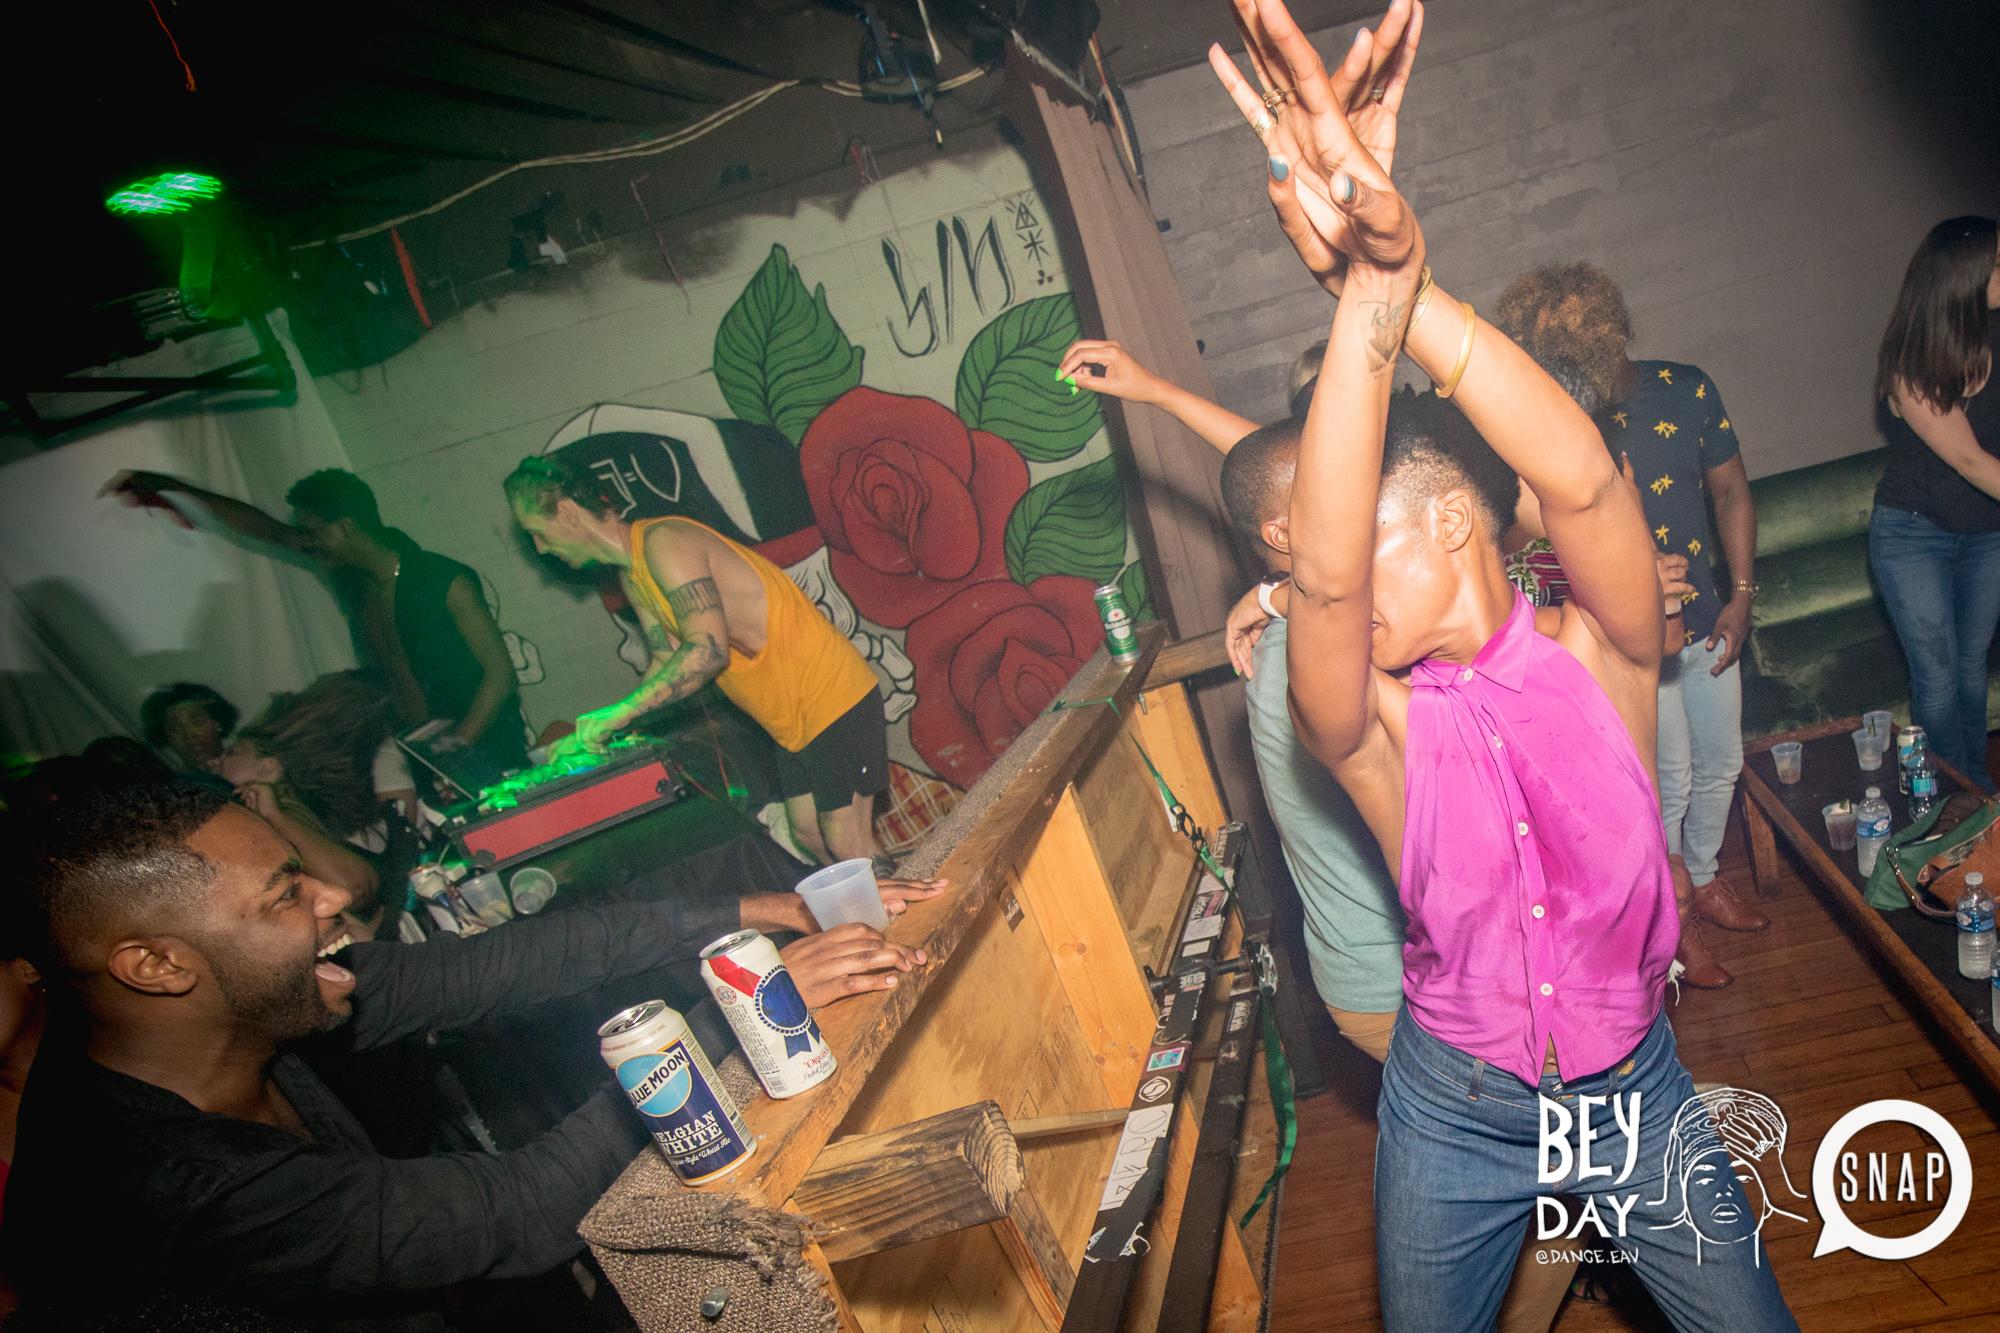 38Bey Day Grace Kelly The Basement Atlanta Oh Snap Kid.jpg